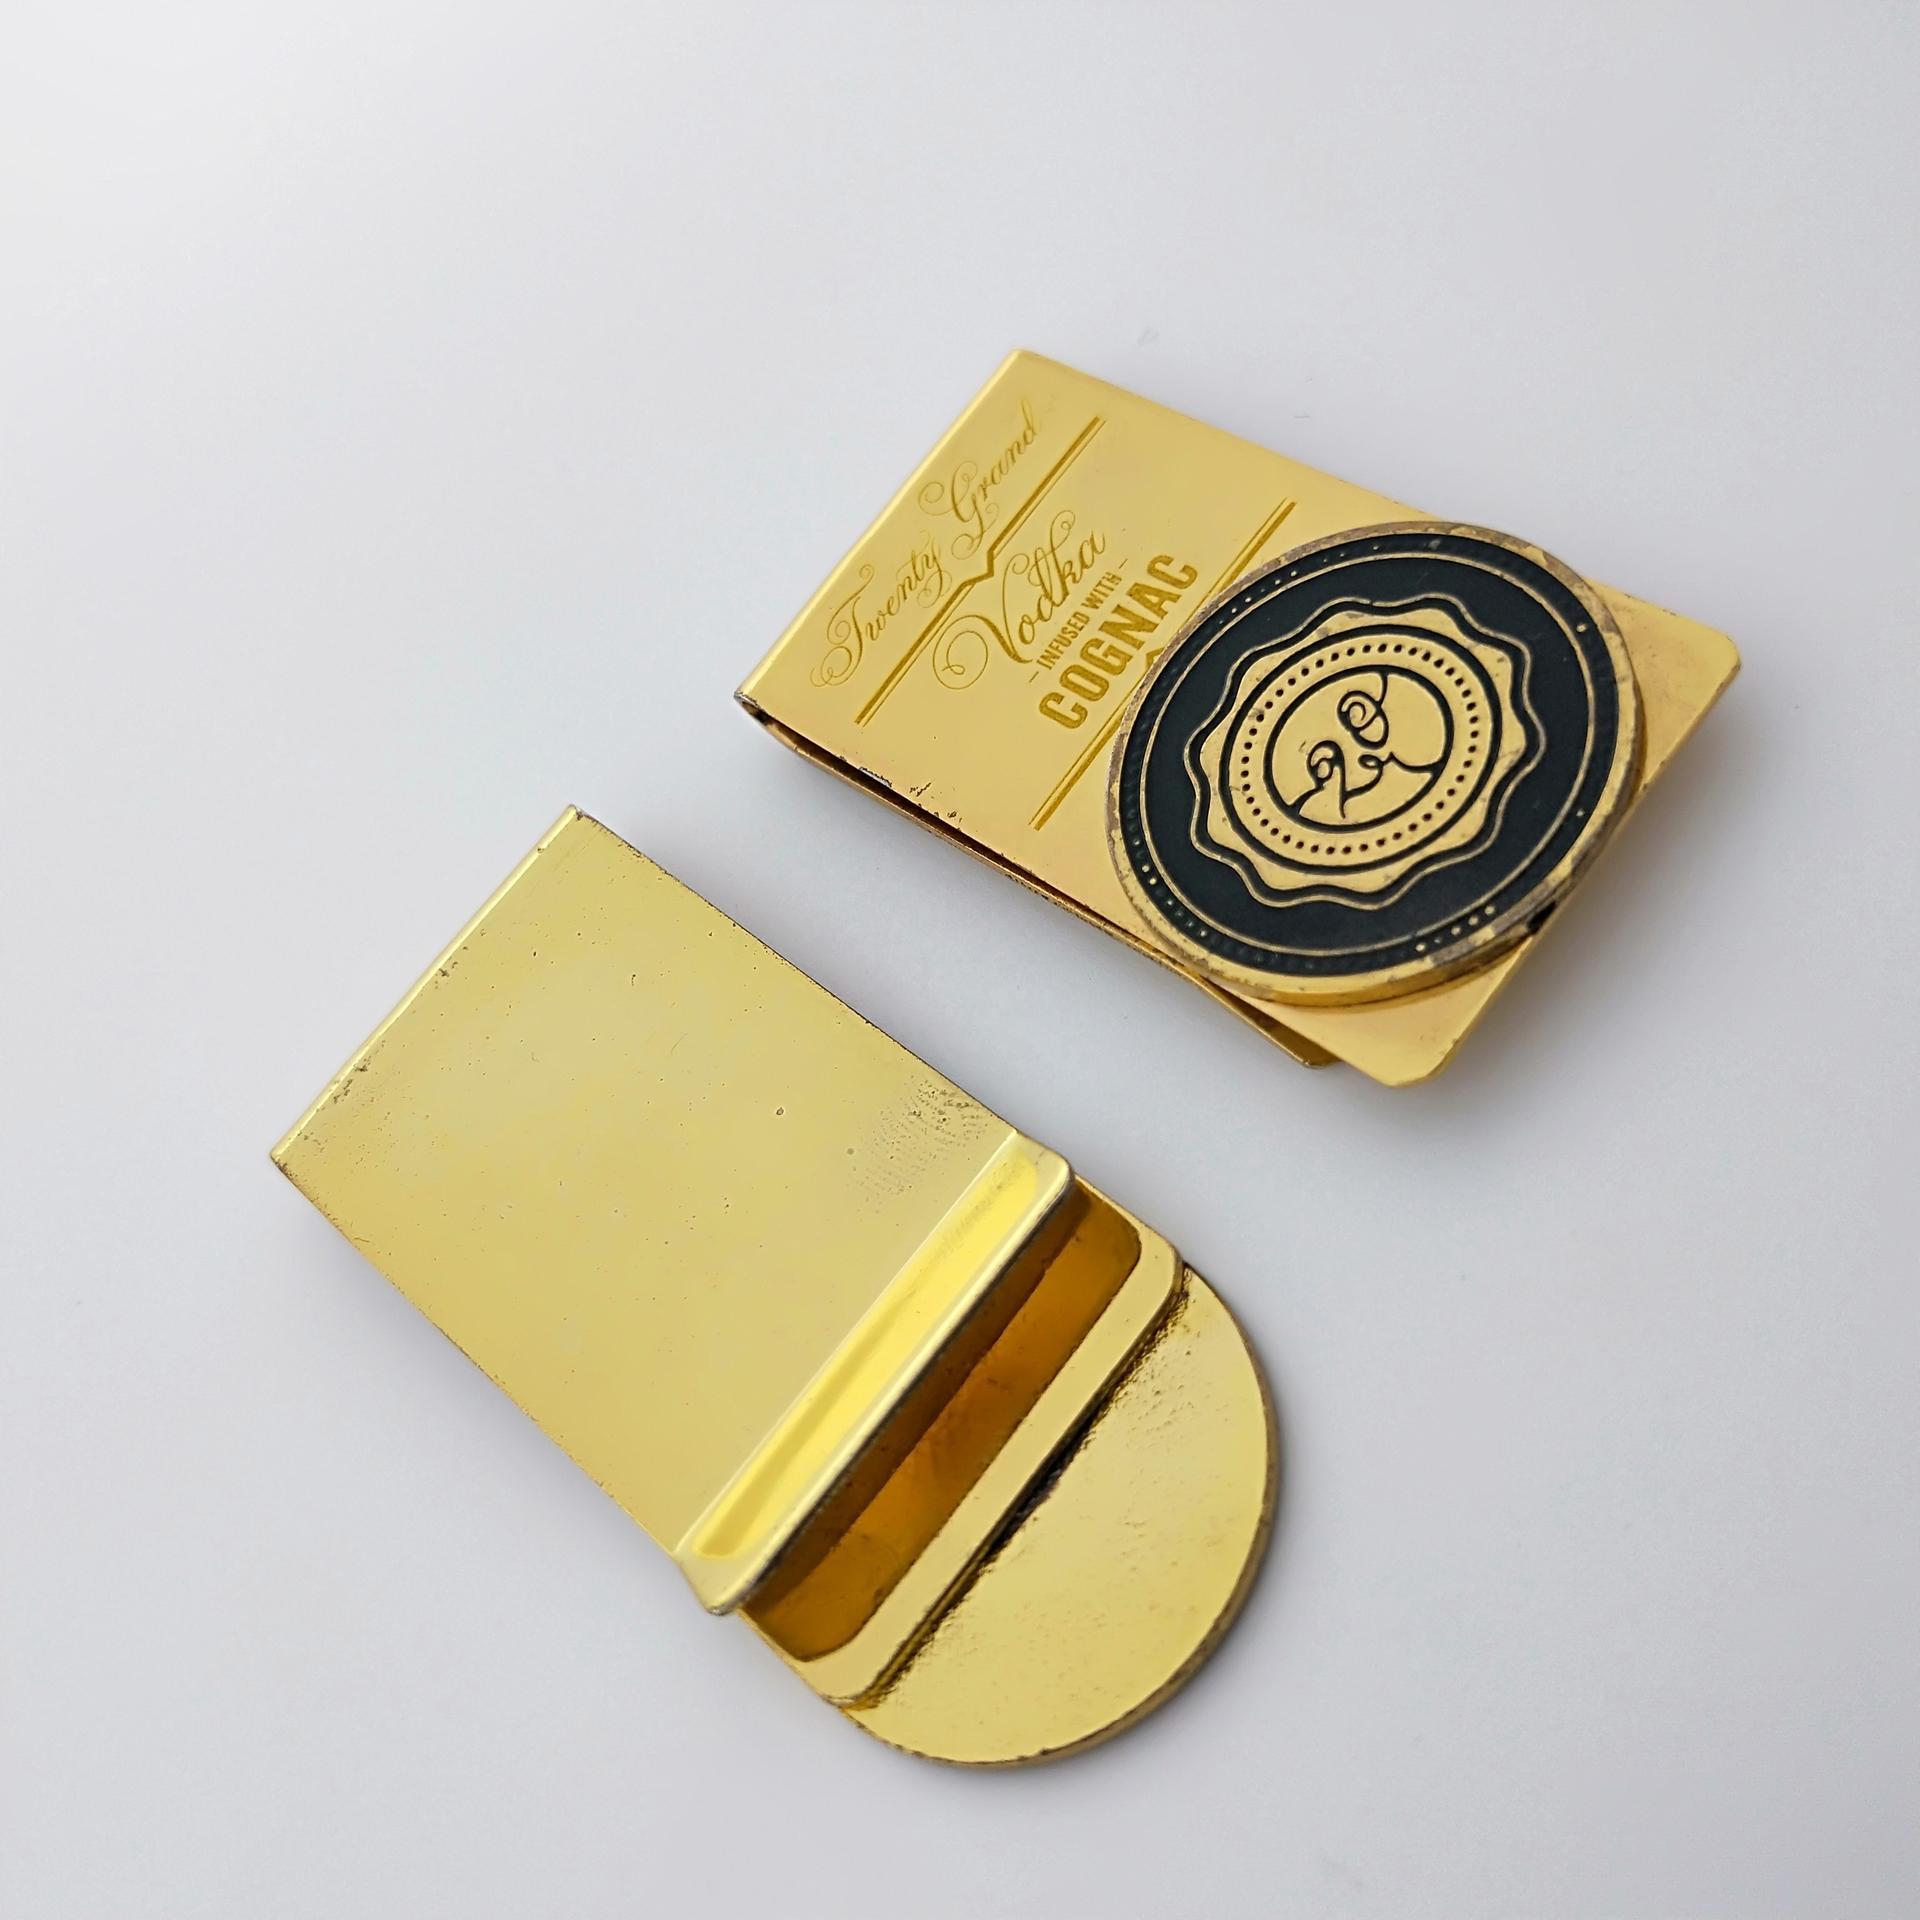 No MOQ customized unique cool men's money clip for police